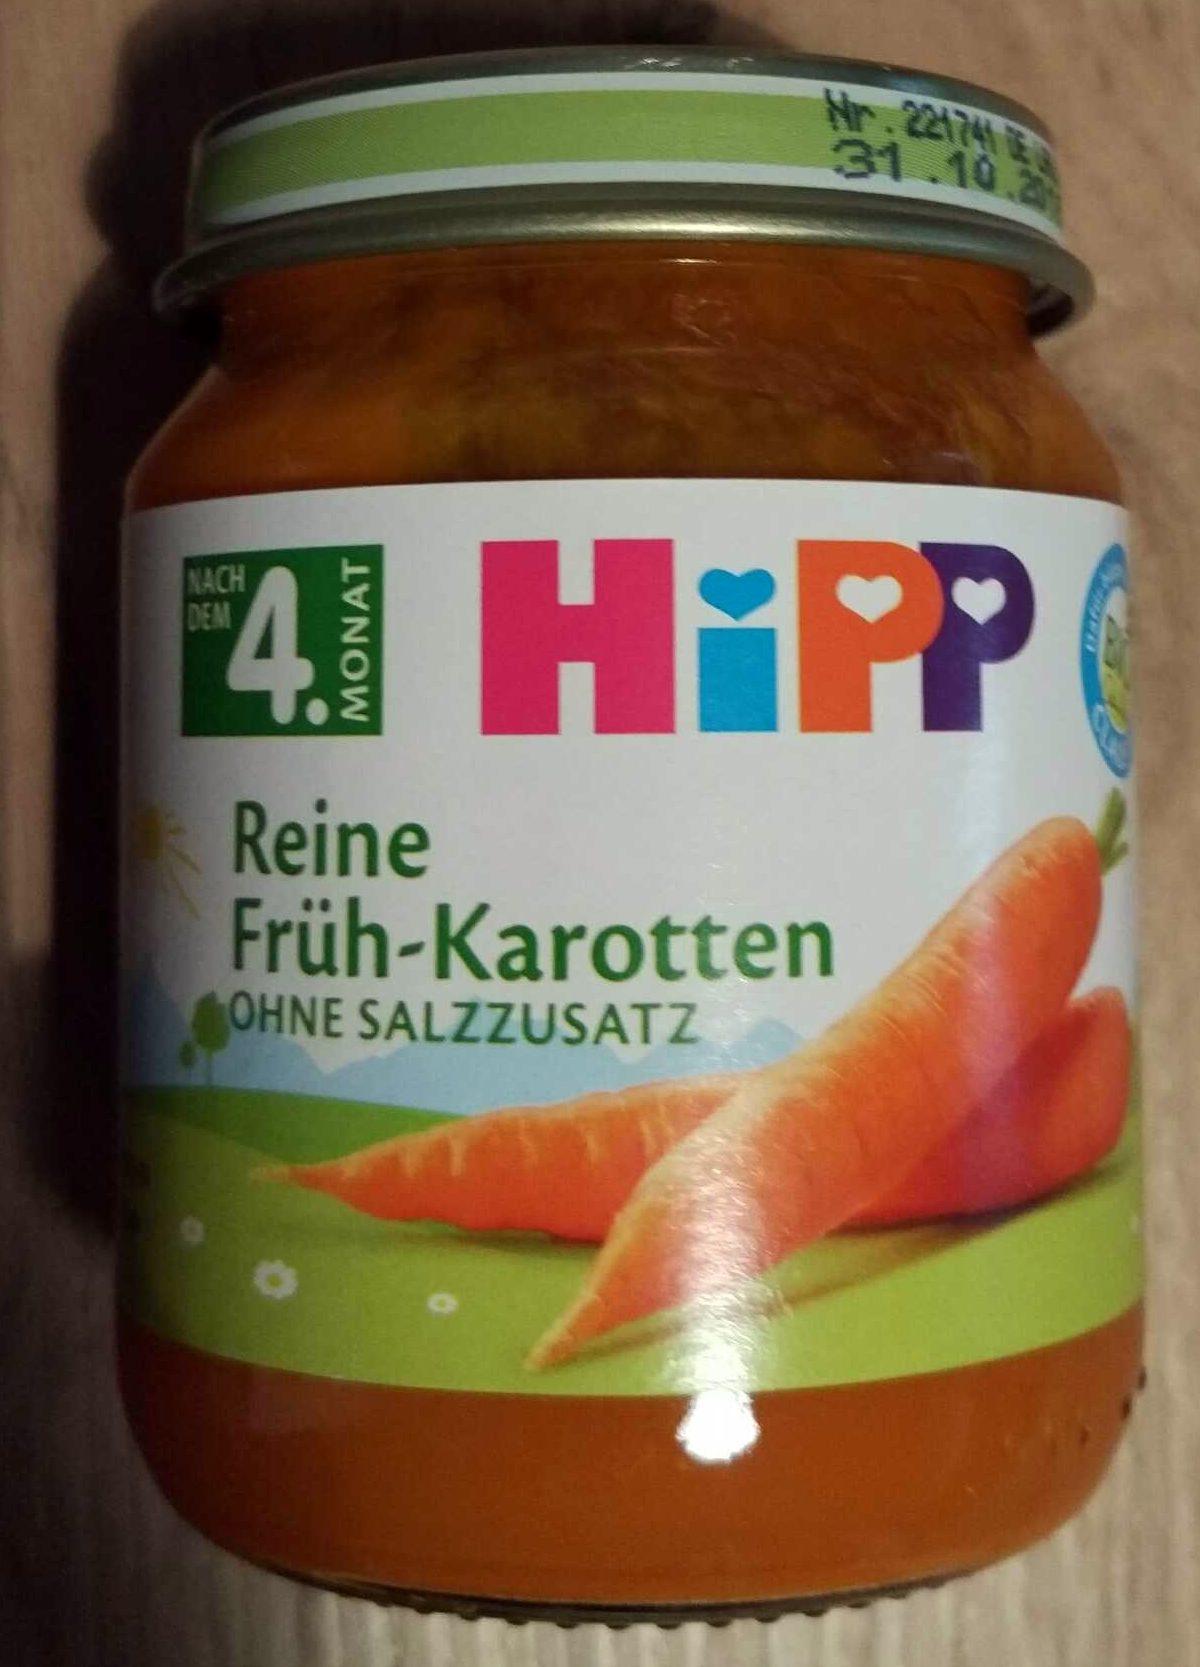 Reine Früh-Karotten - Produkt